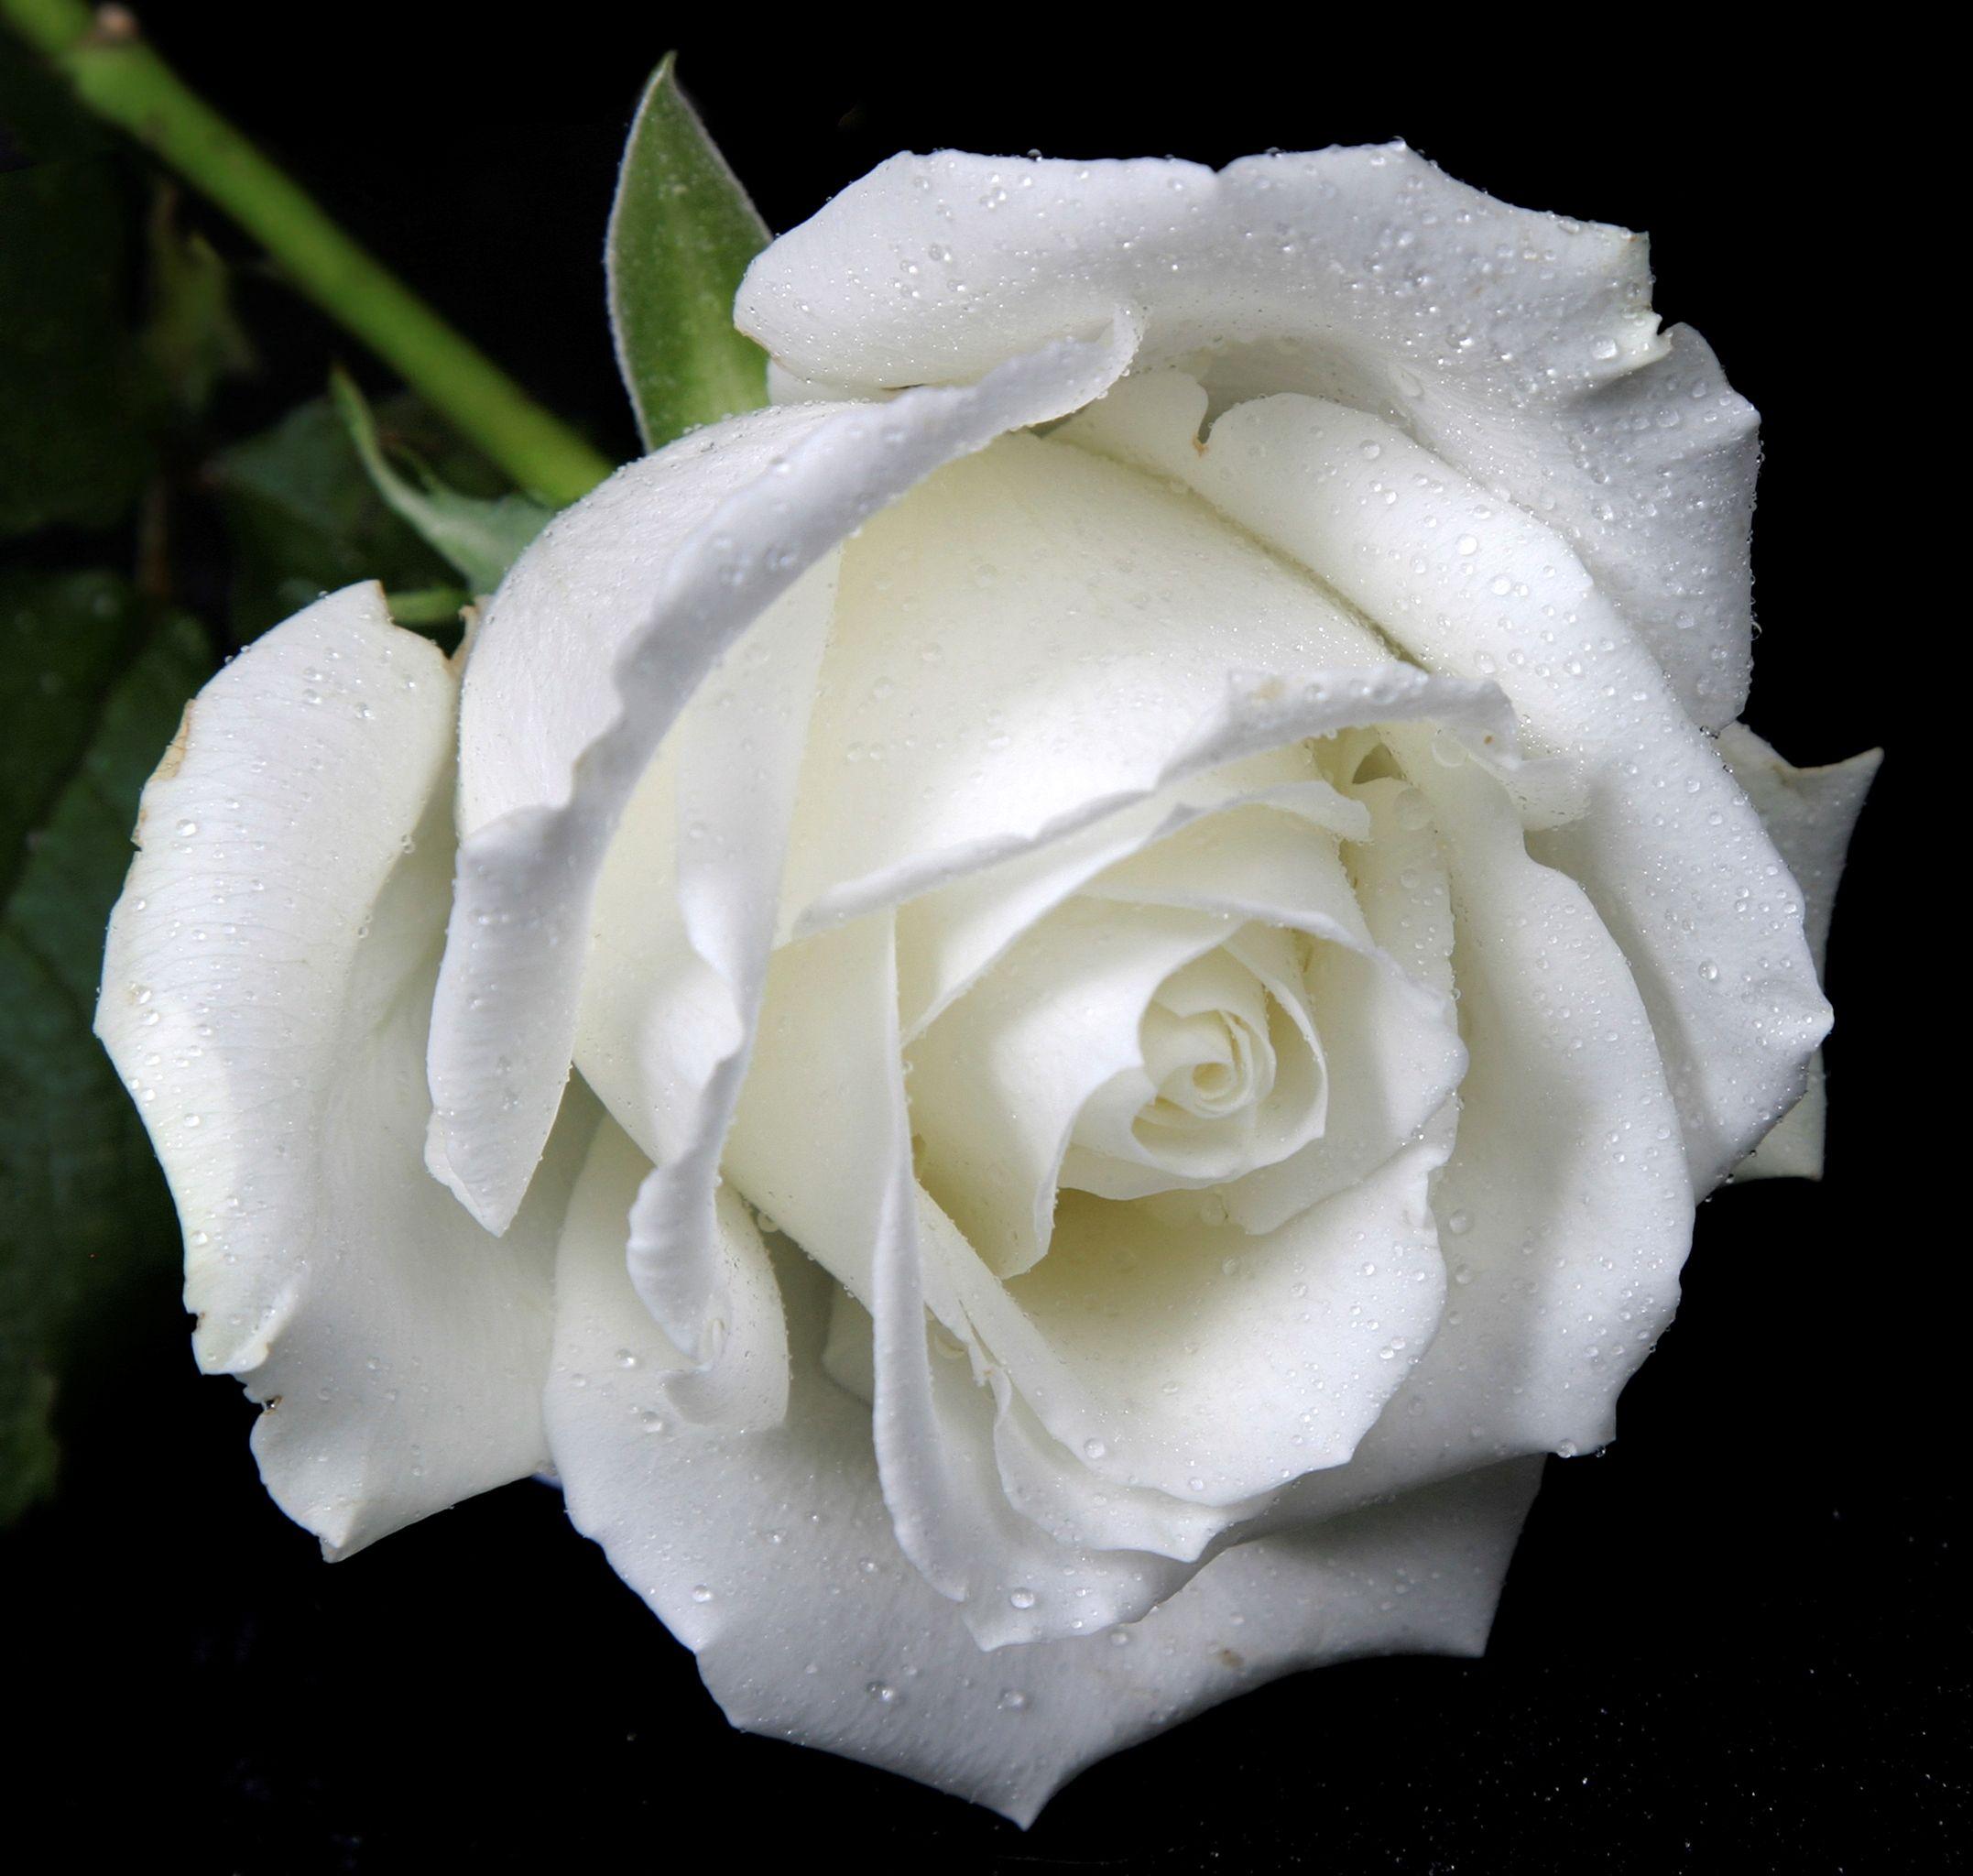 google pinterest flowers white rose flower meaningwhite rose flower white rose symbolic white flowers white rose meaning without vibrant color to upstage it mightylinksfo